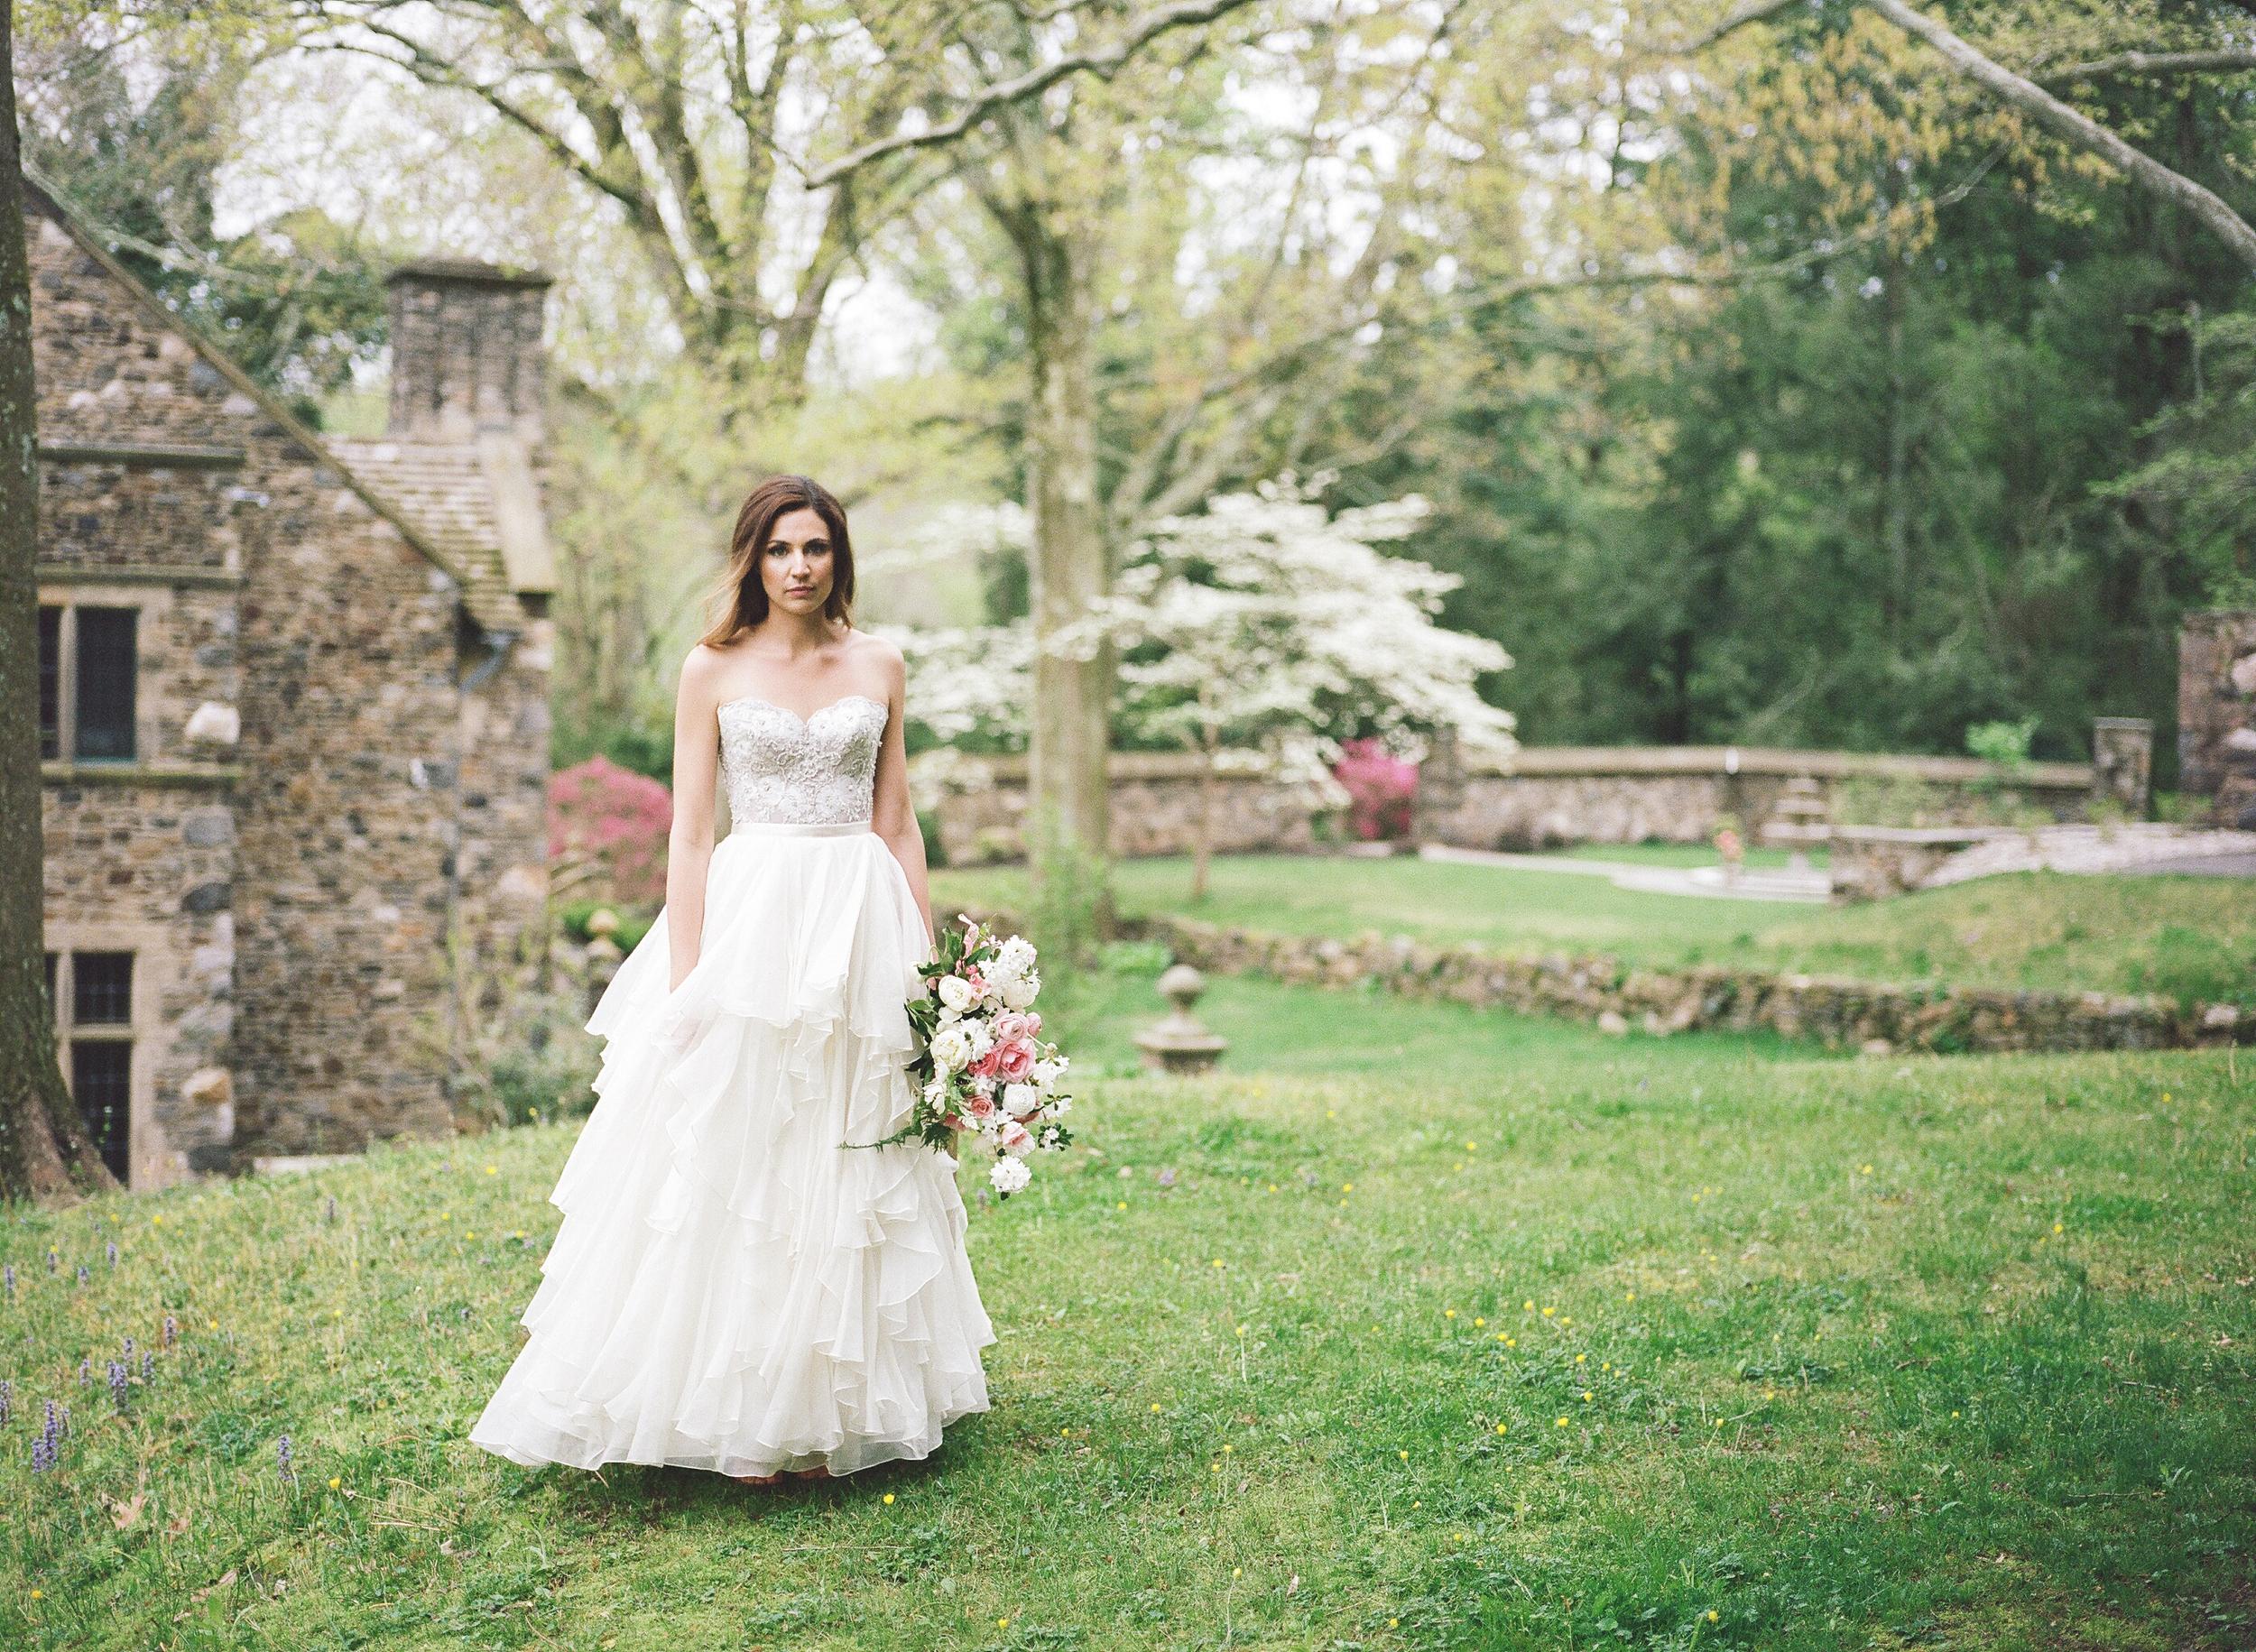 HNP-Modern-Fairytale-Spring-Wedding-Styled-Shoot_088.jpg